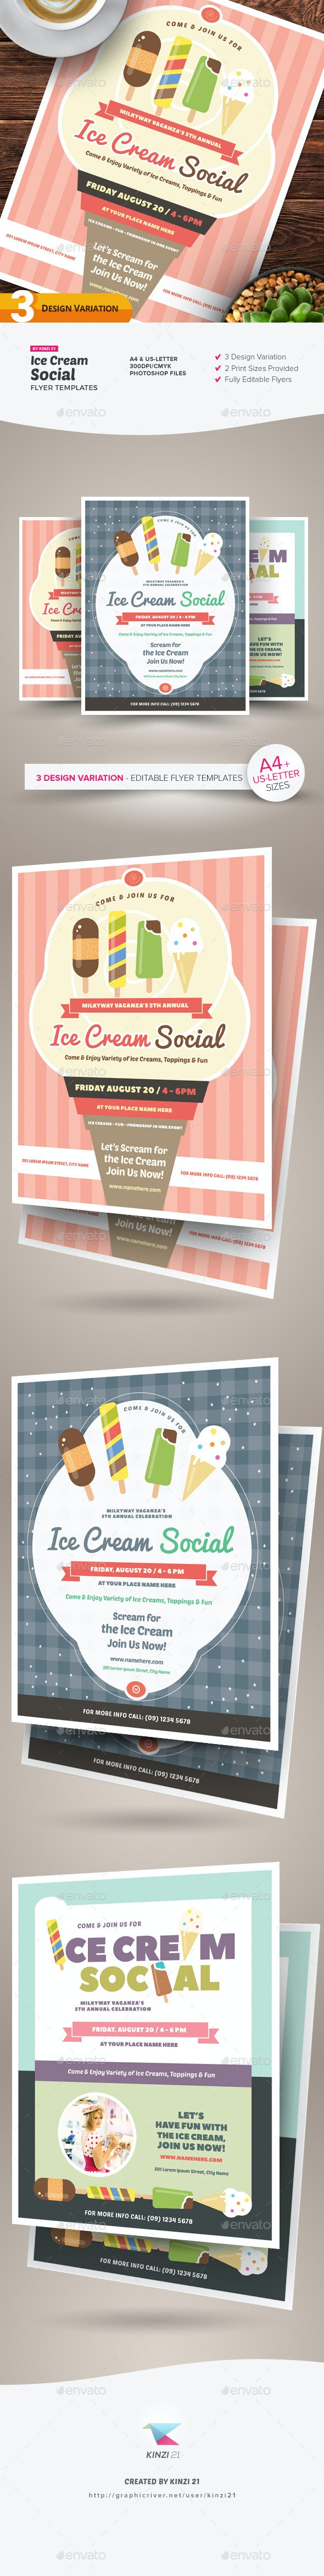 Ice Cream Social Flyer Templates - Miscellaneous Events